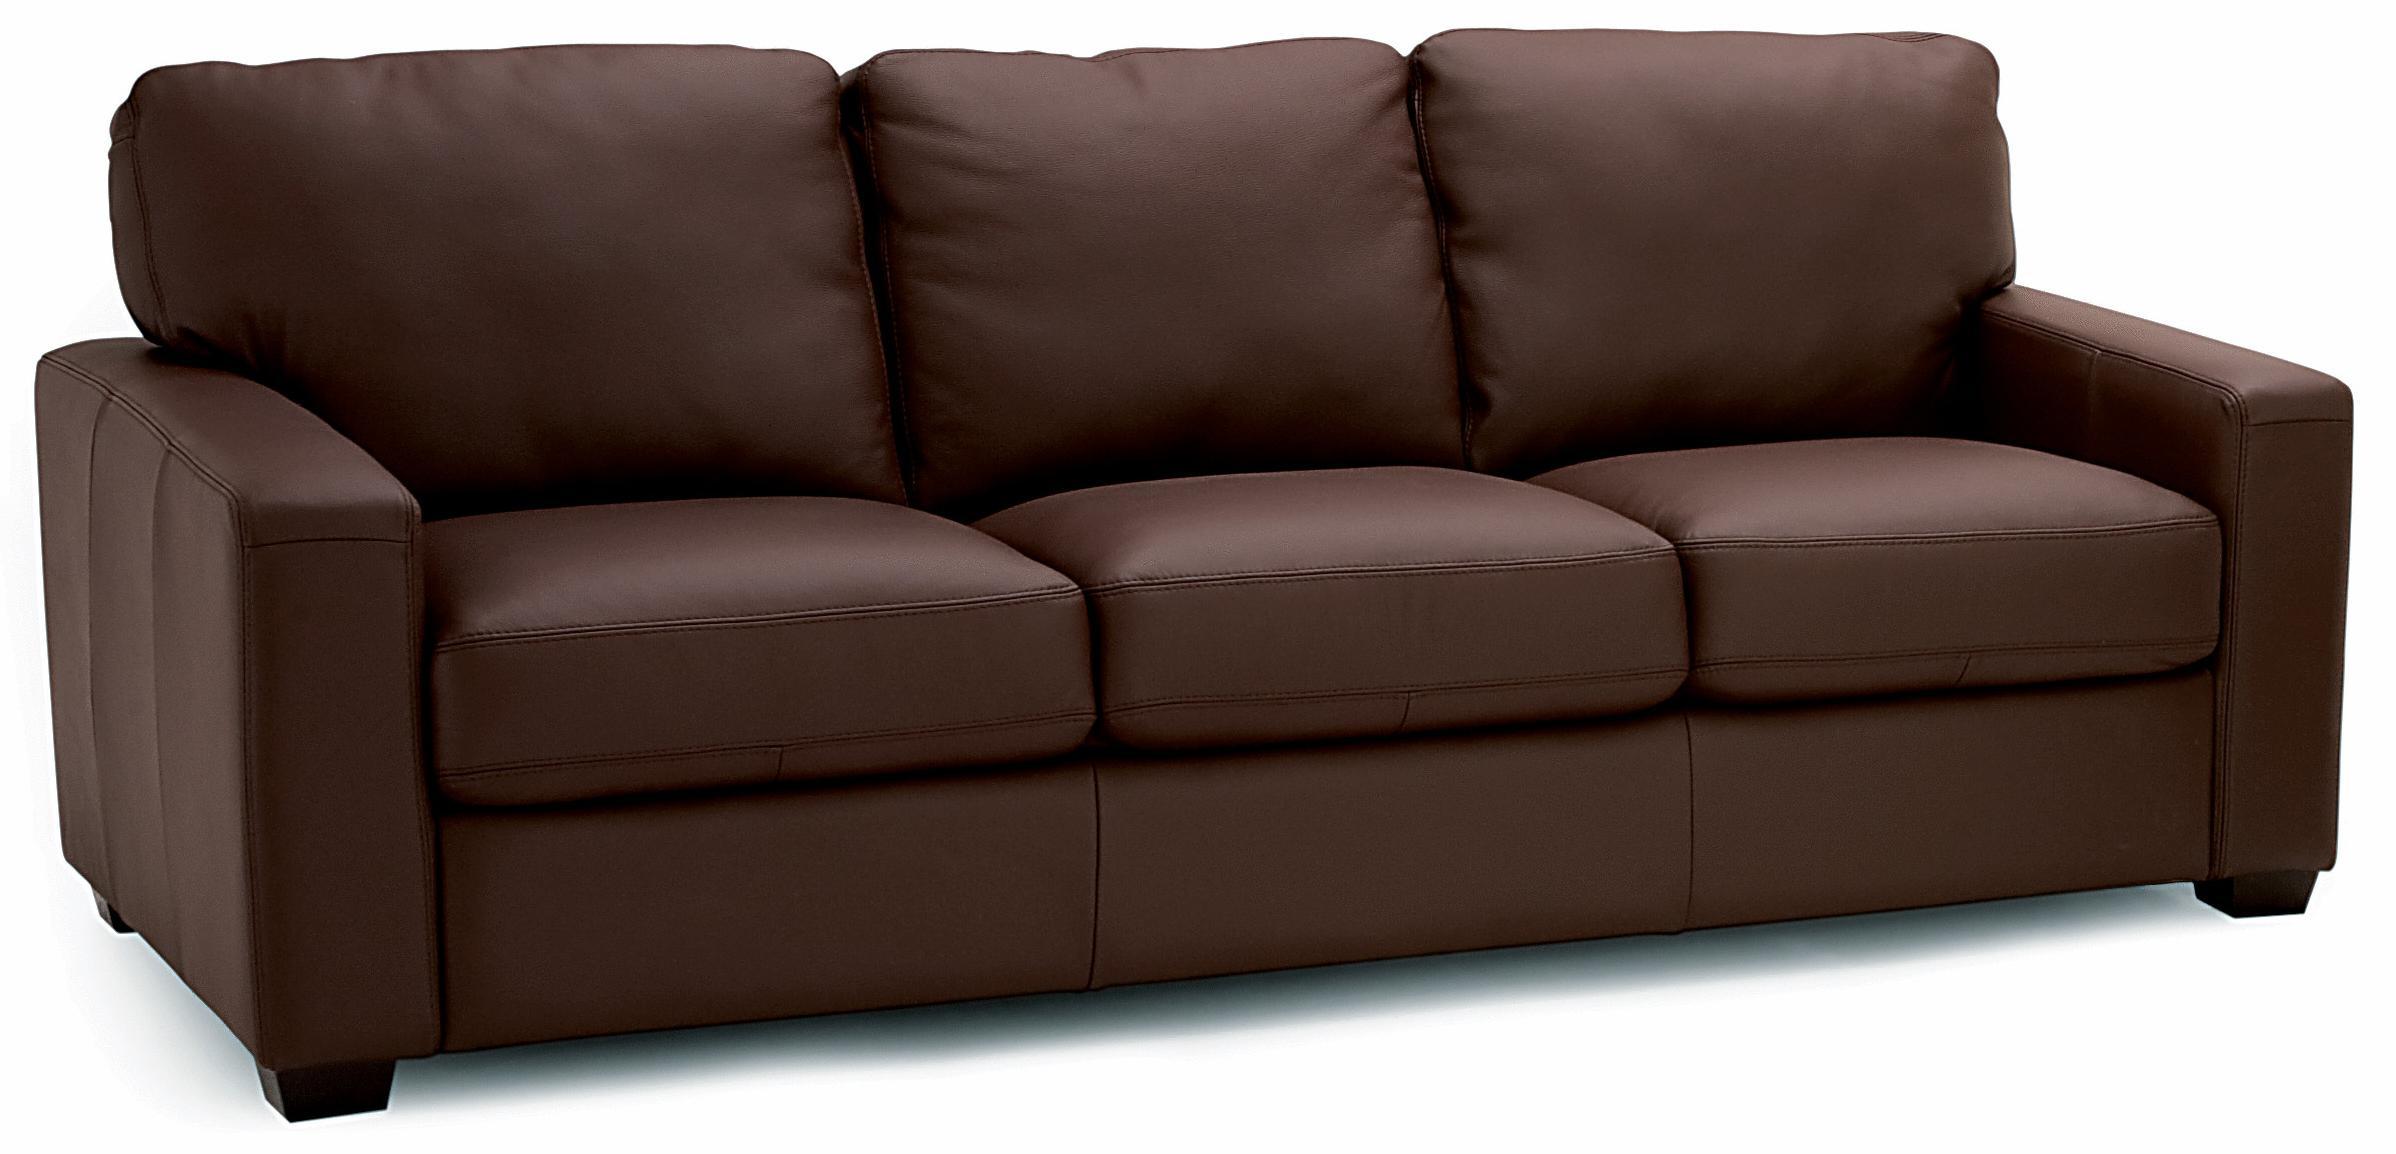 Westend Sofa by Palliser at Novello Home Furnishings